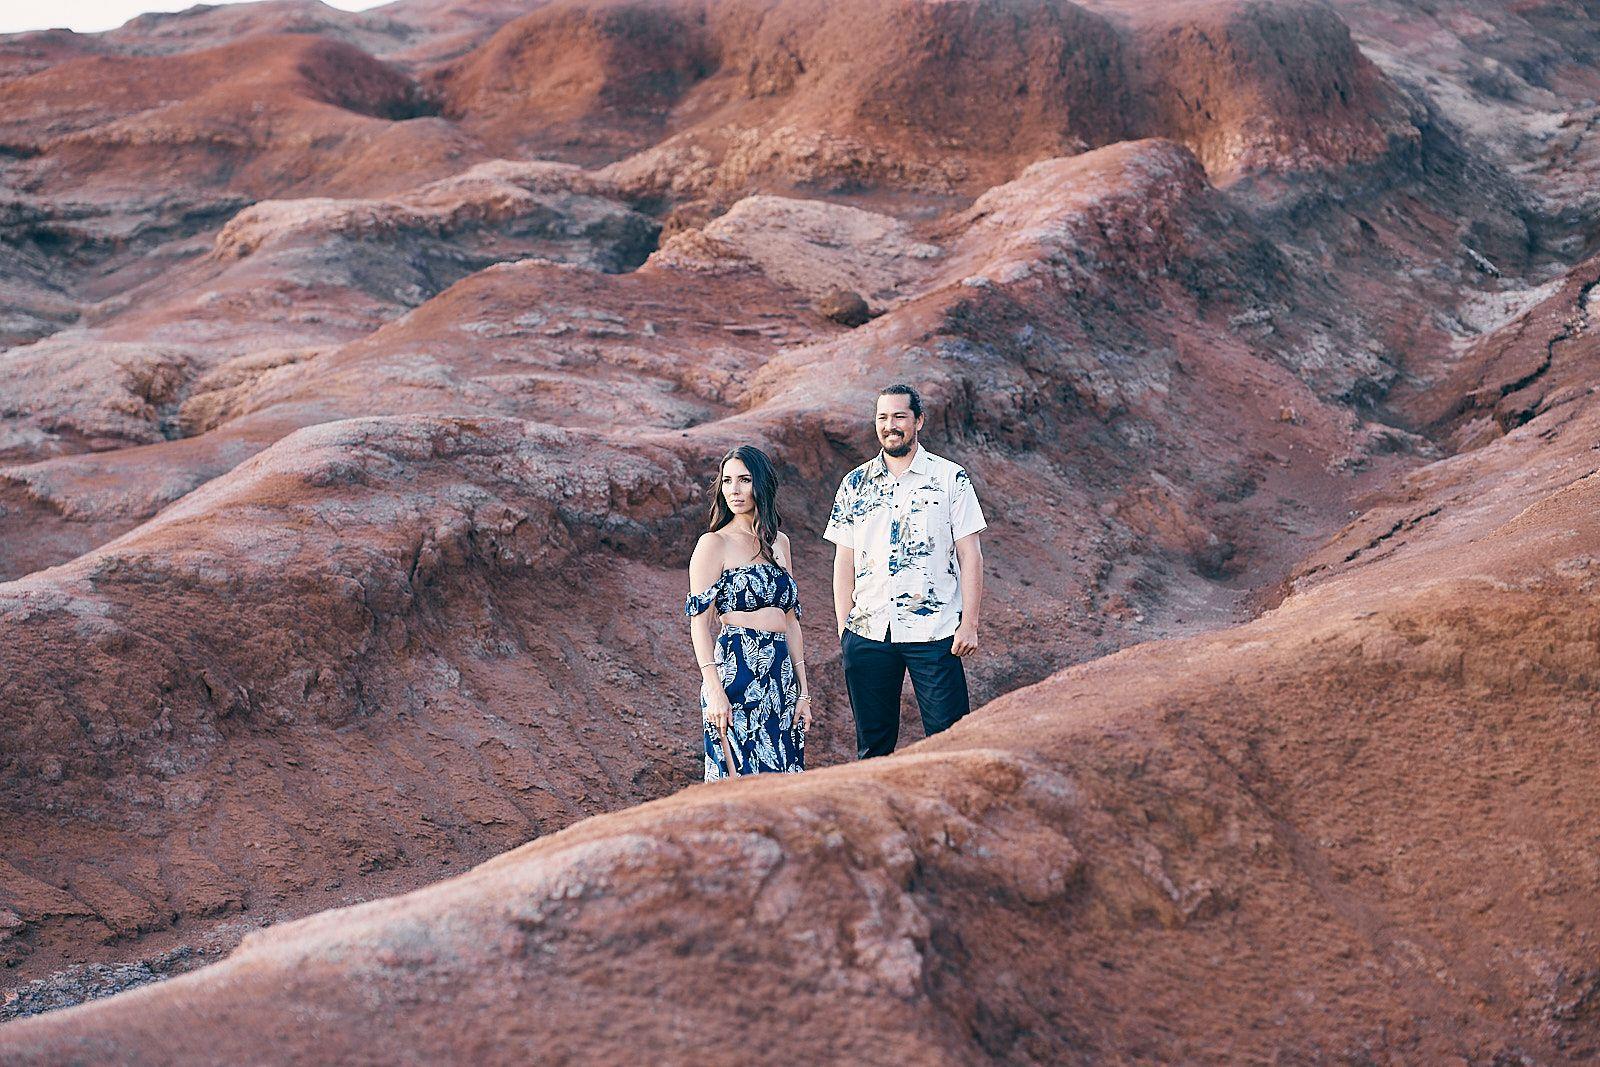 kauai-engagement-photographer-afewgoodclicks 47